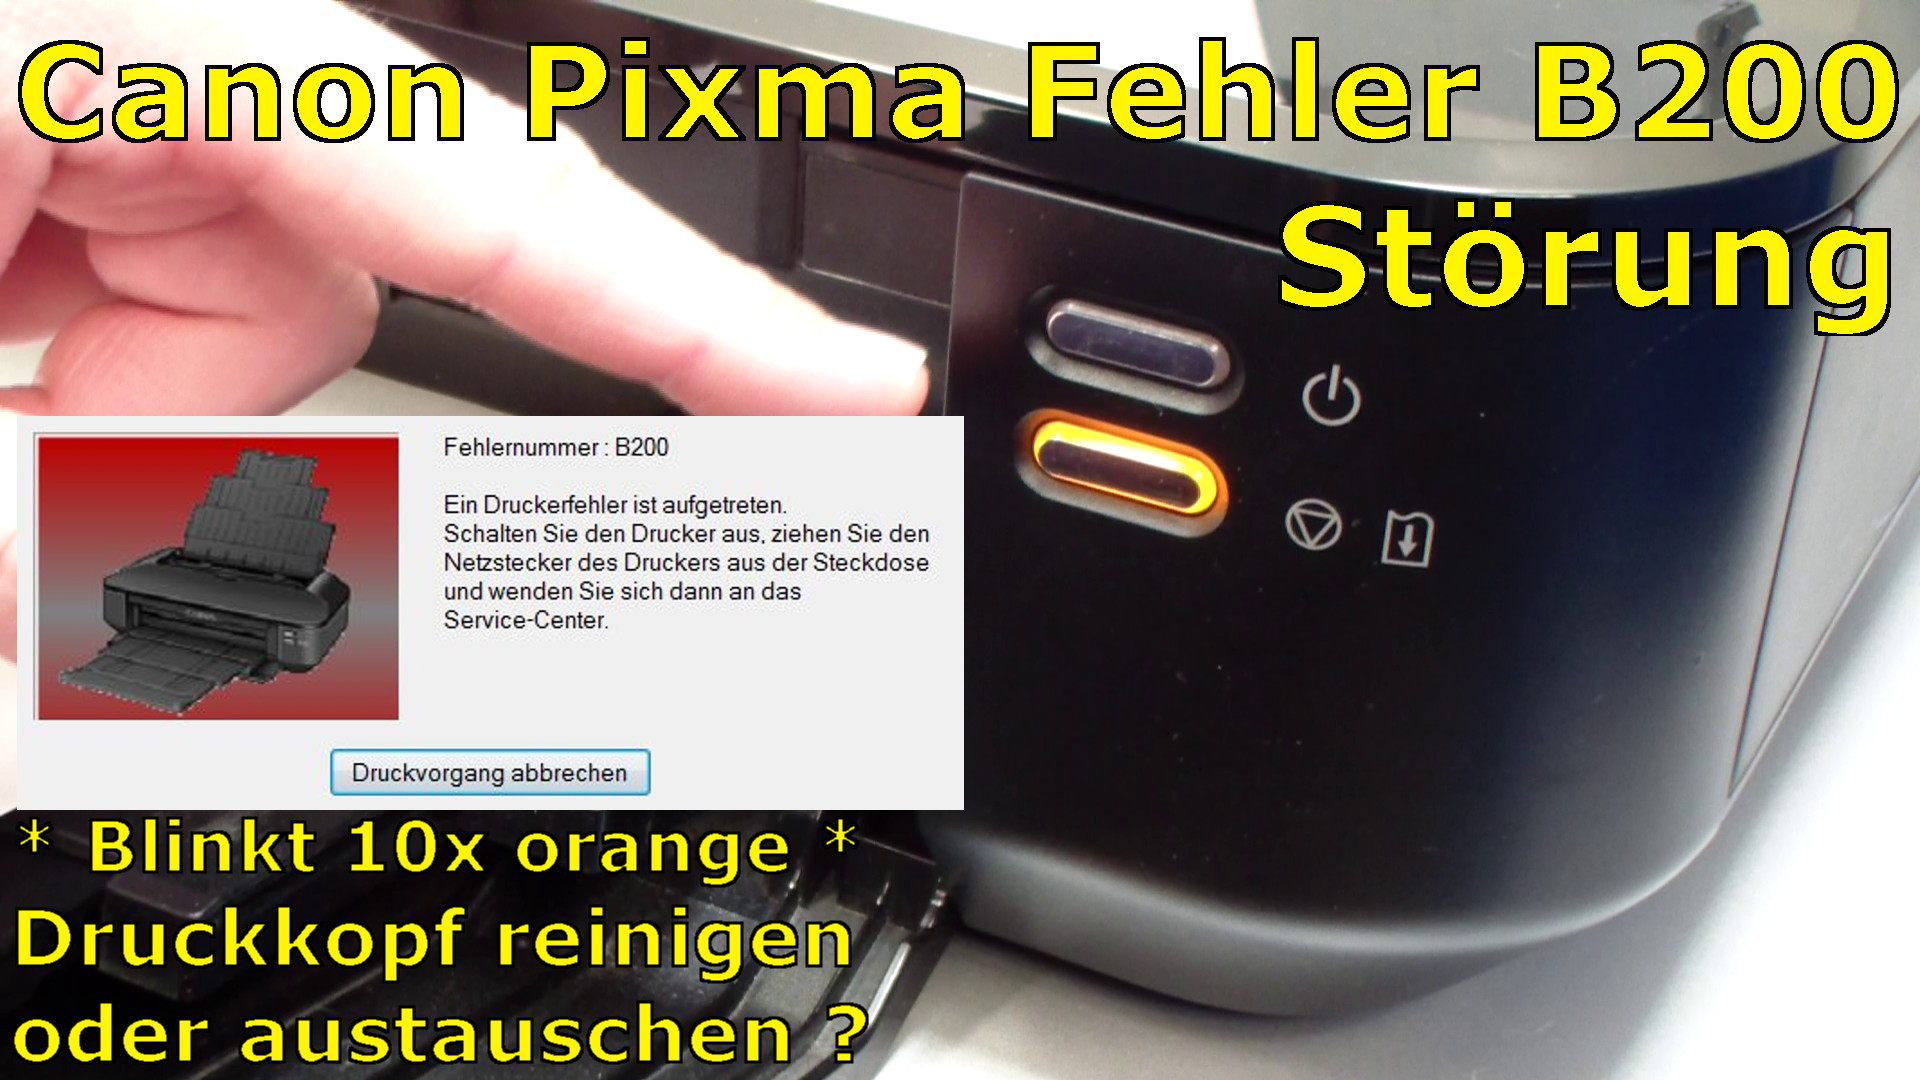 canon pixma b200 error fehler beheben fix mit video english subtitles tuhl teim de. Black Bedroom Furniture Sets. Home Design Ideas